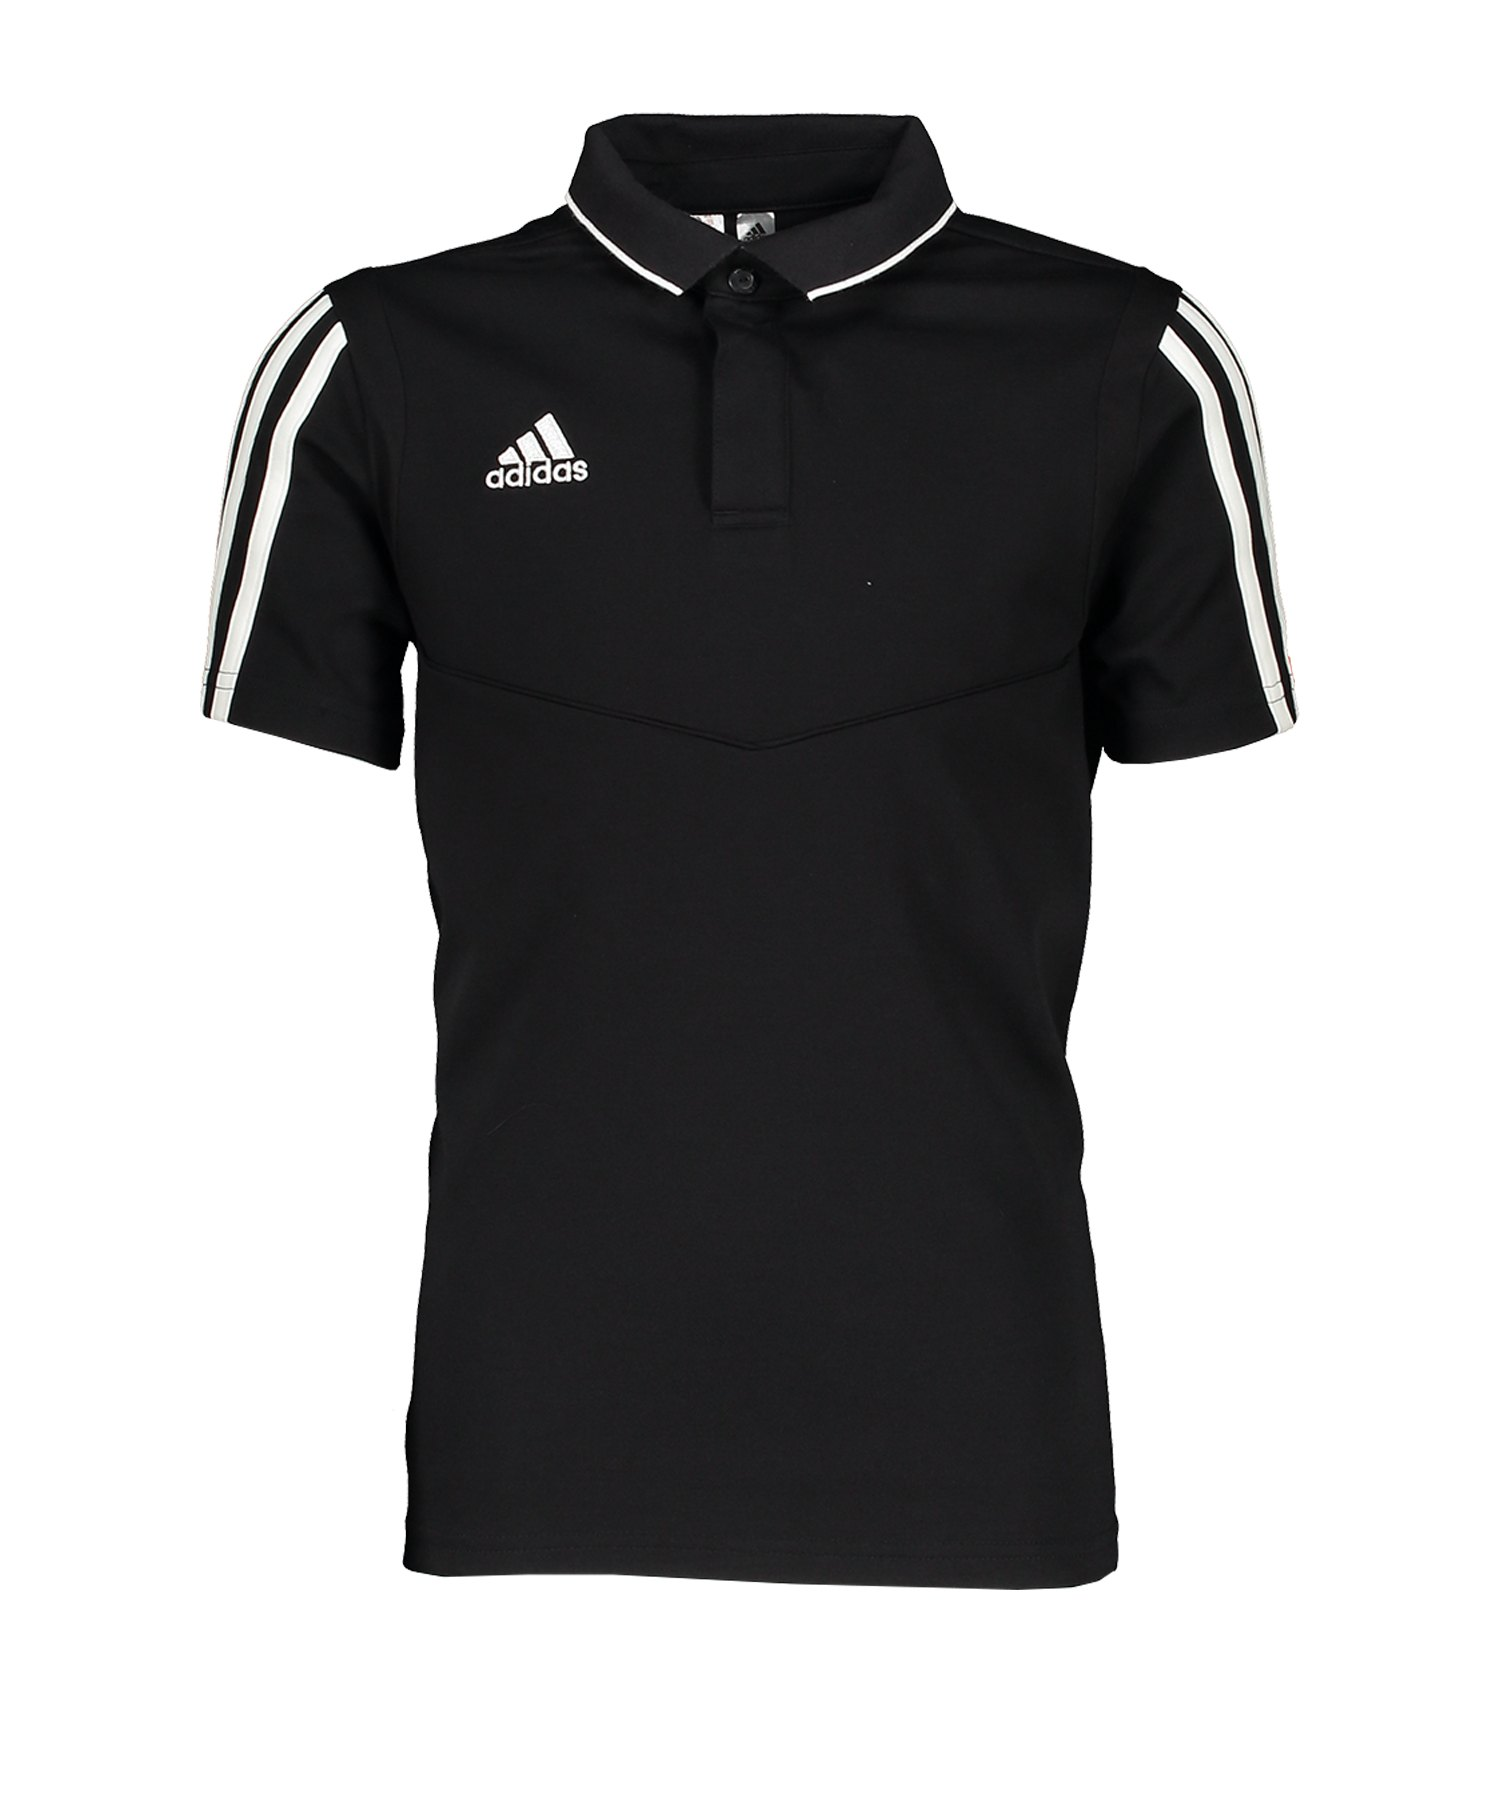 adidas Tiro 19 Poloshirt Kids Schwarz Weiss - schwarz